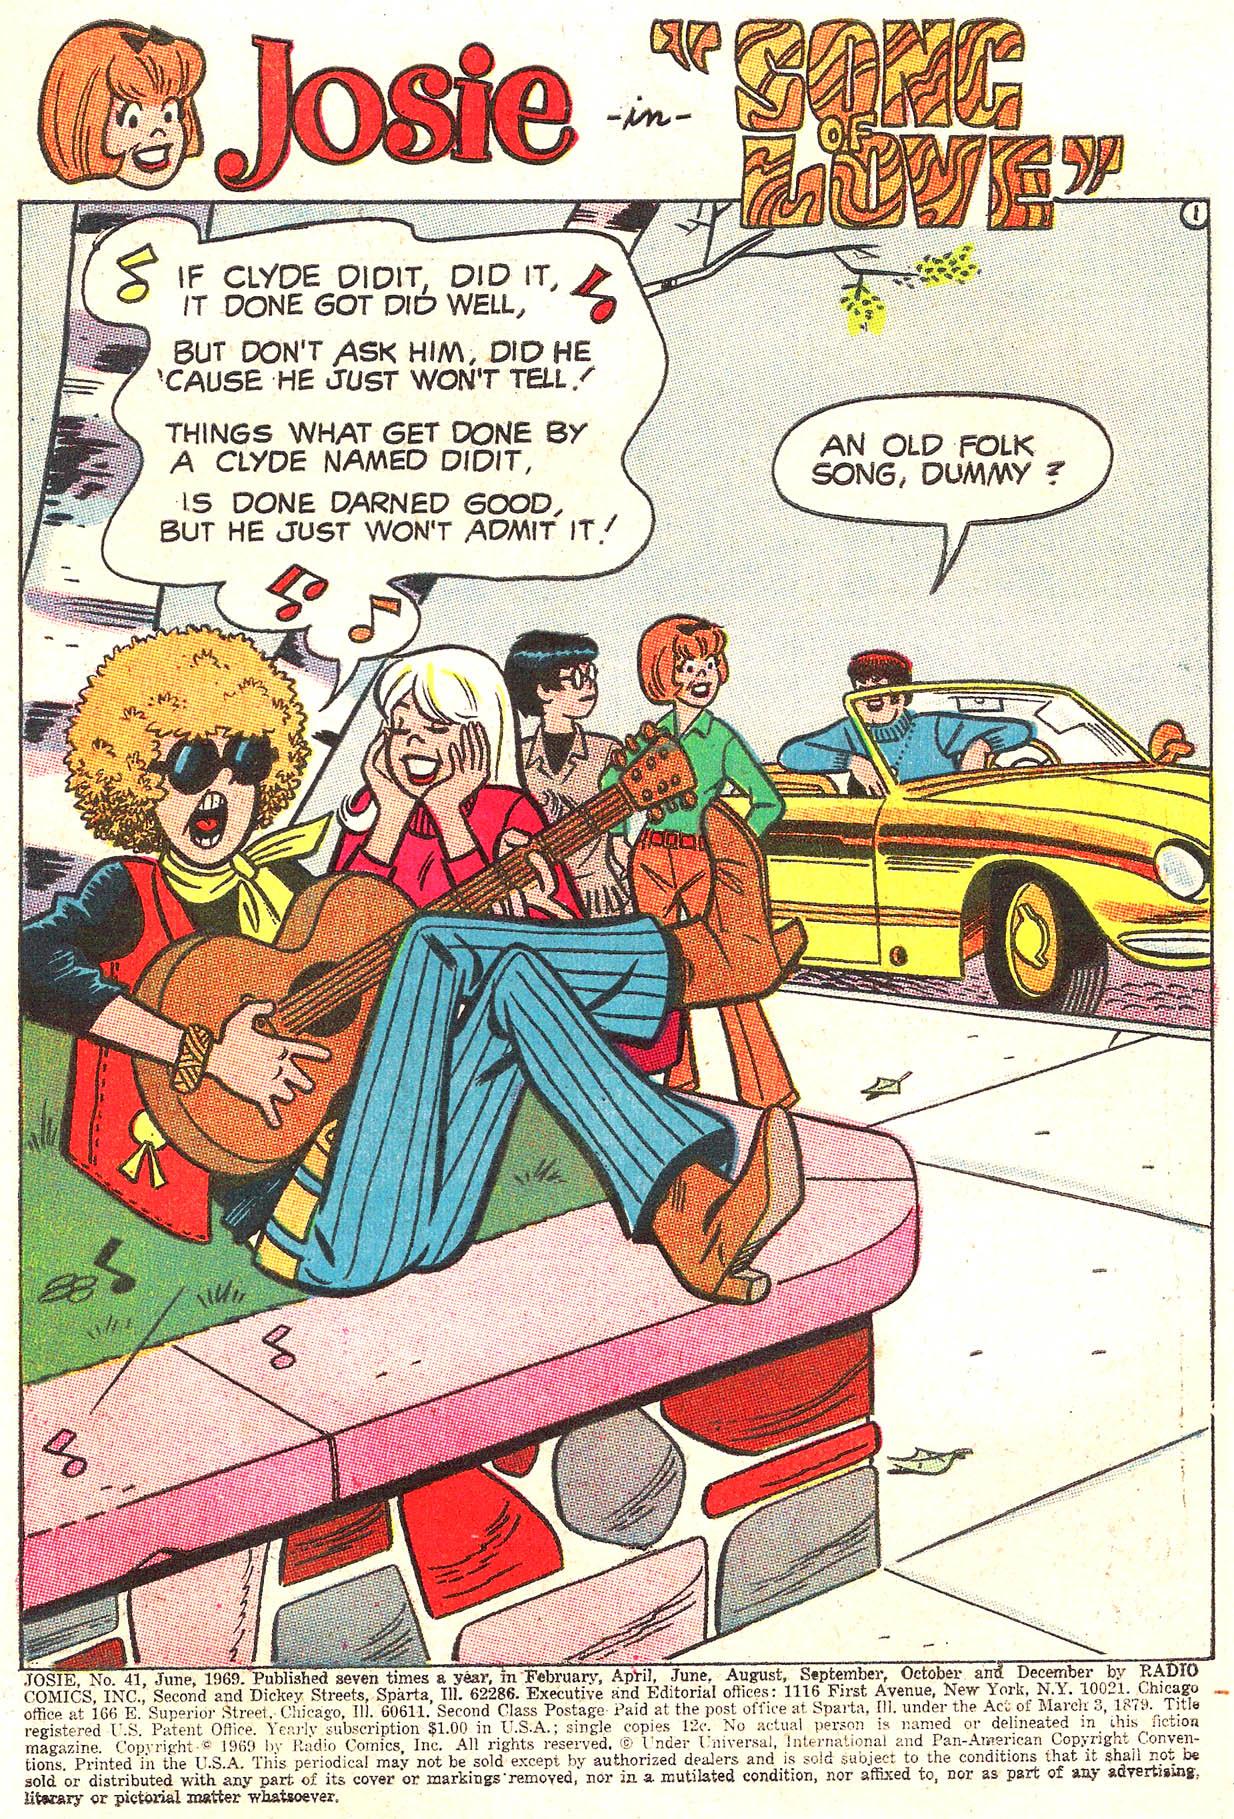 Read online She's Josie comic -  Issue #41 - 3